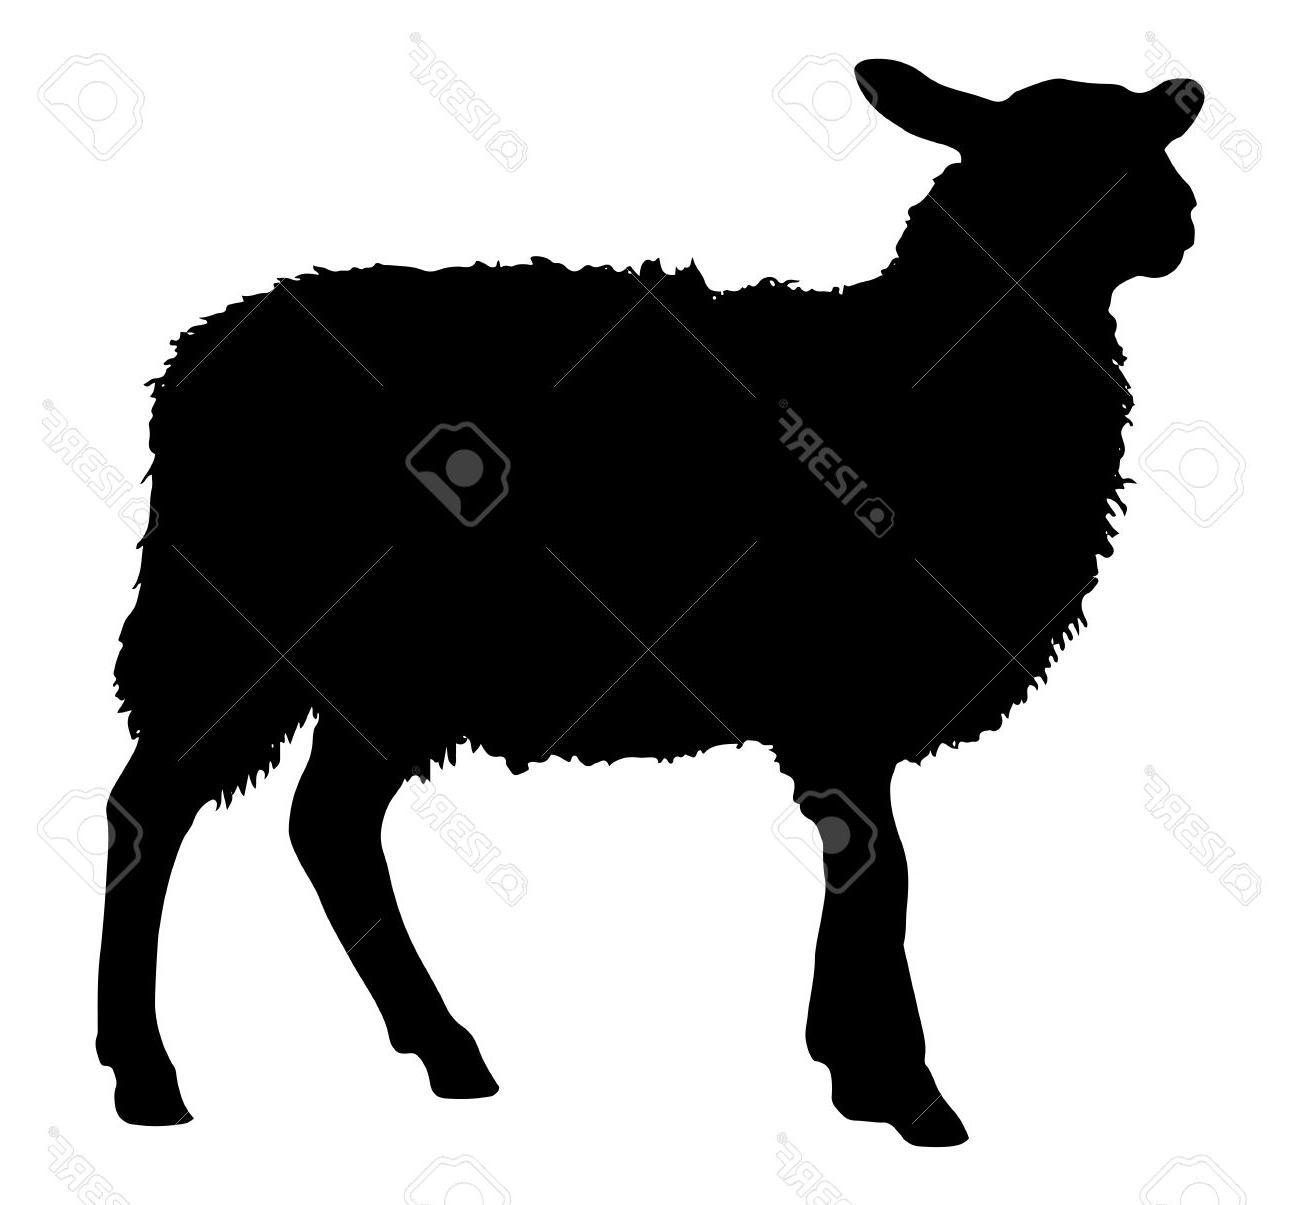 Unique Sheep Silhouette Clip Art Free Photos » Free Vector.